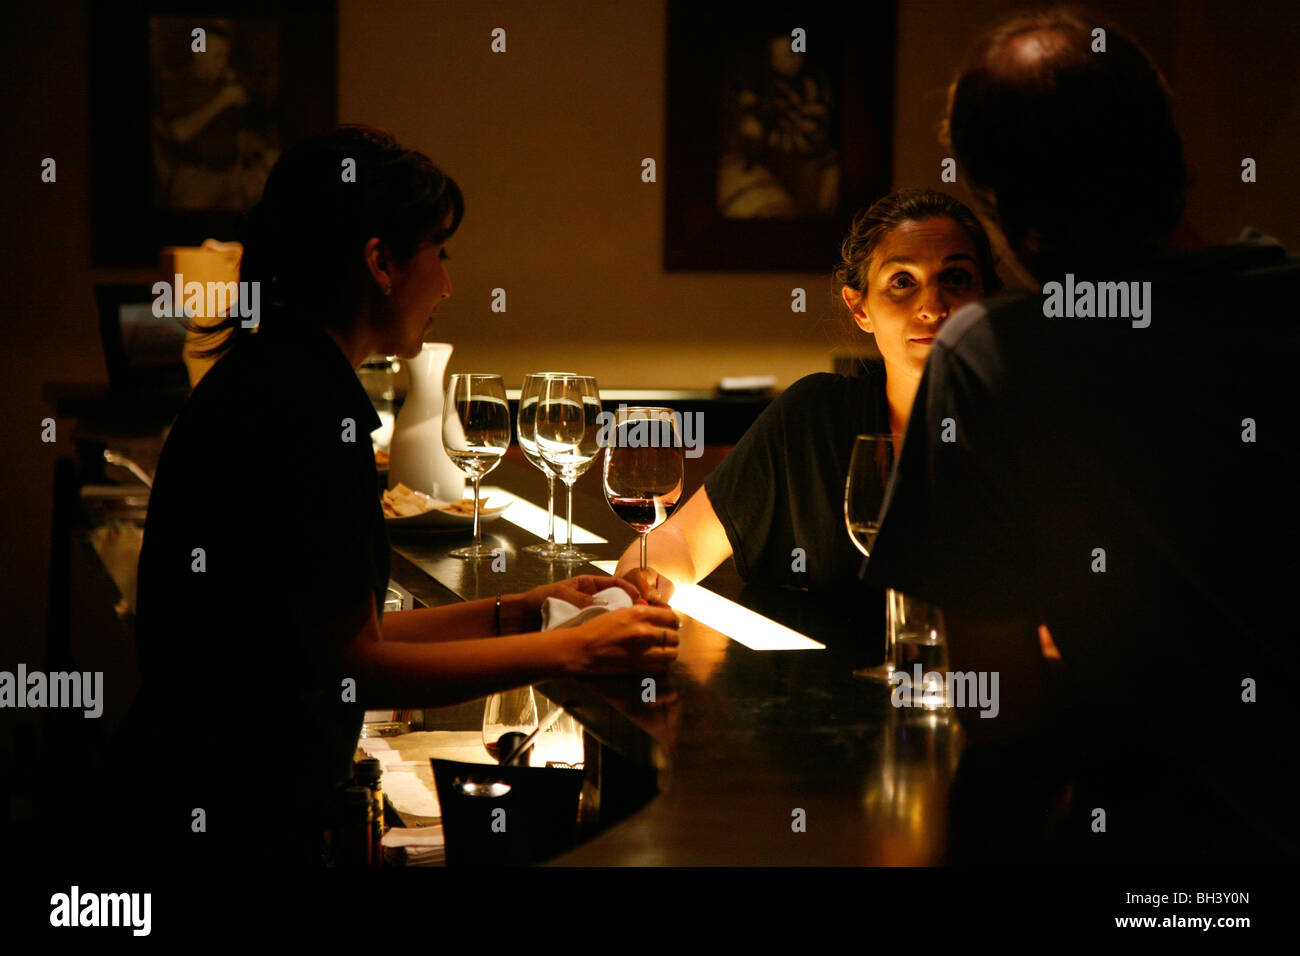 People drinking wine at the tasting room of Vines of Mendoza wine bar, Mendoza, Argentina. - Stock Image